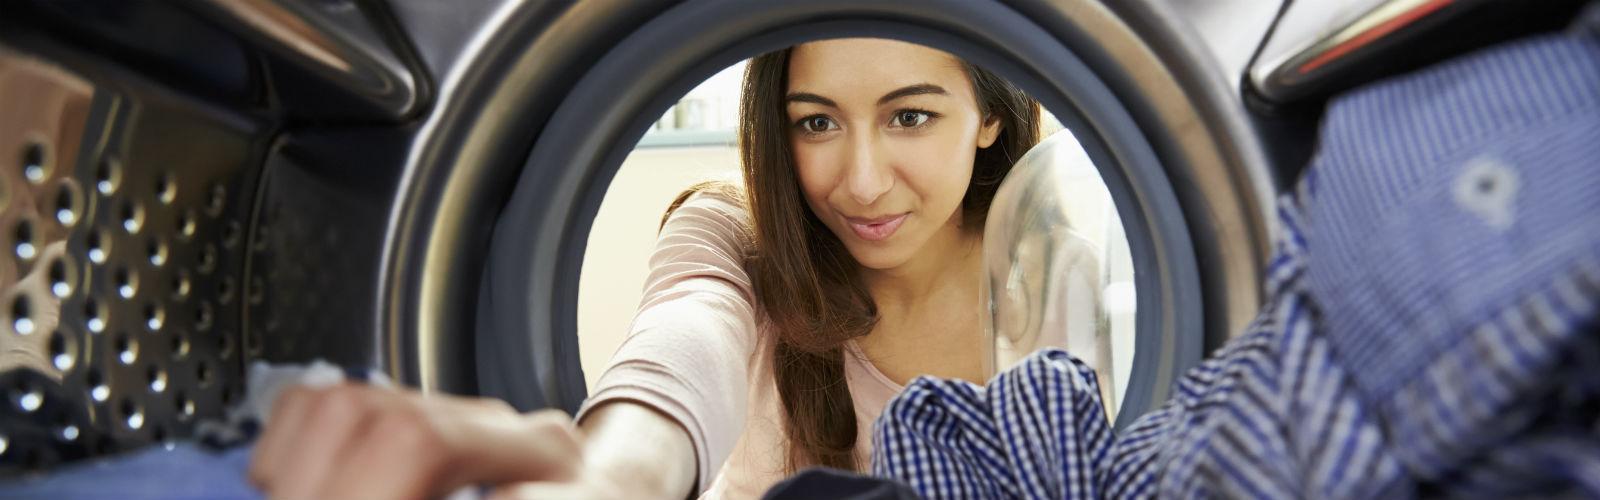 Woman loads washing into a washing machine